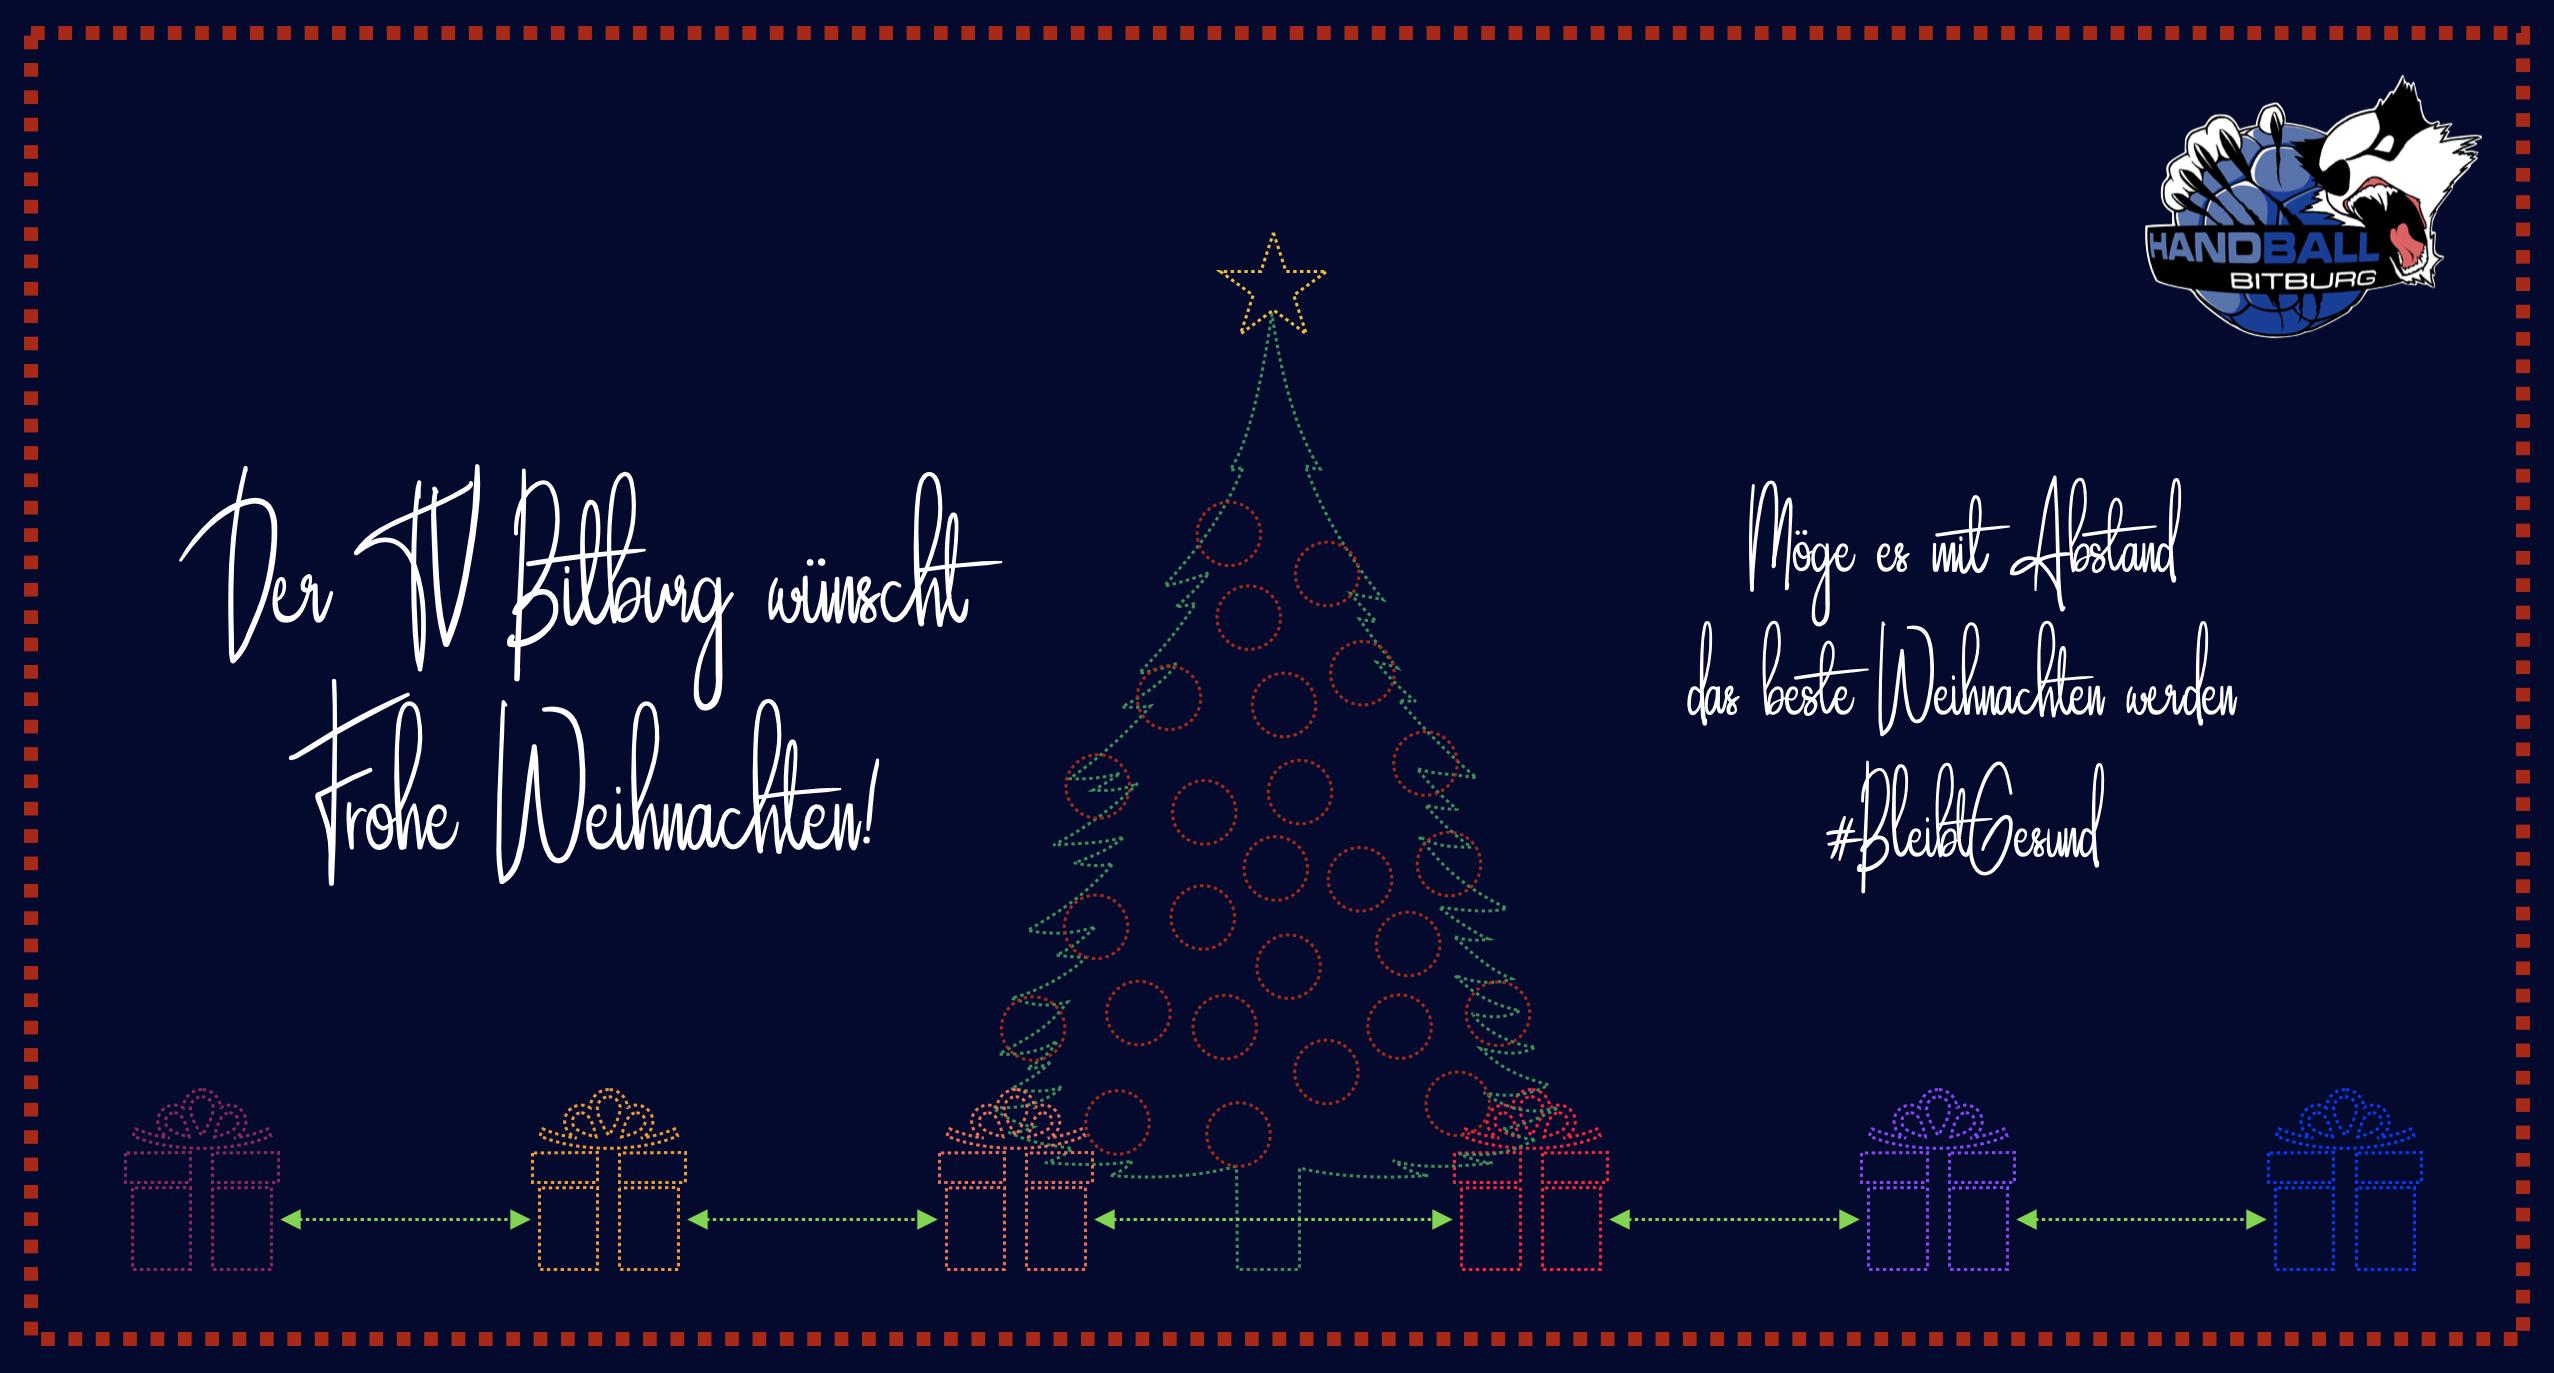 Der TVB wünscht frohe Weihnachten!